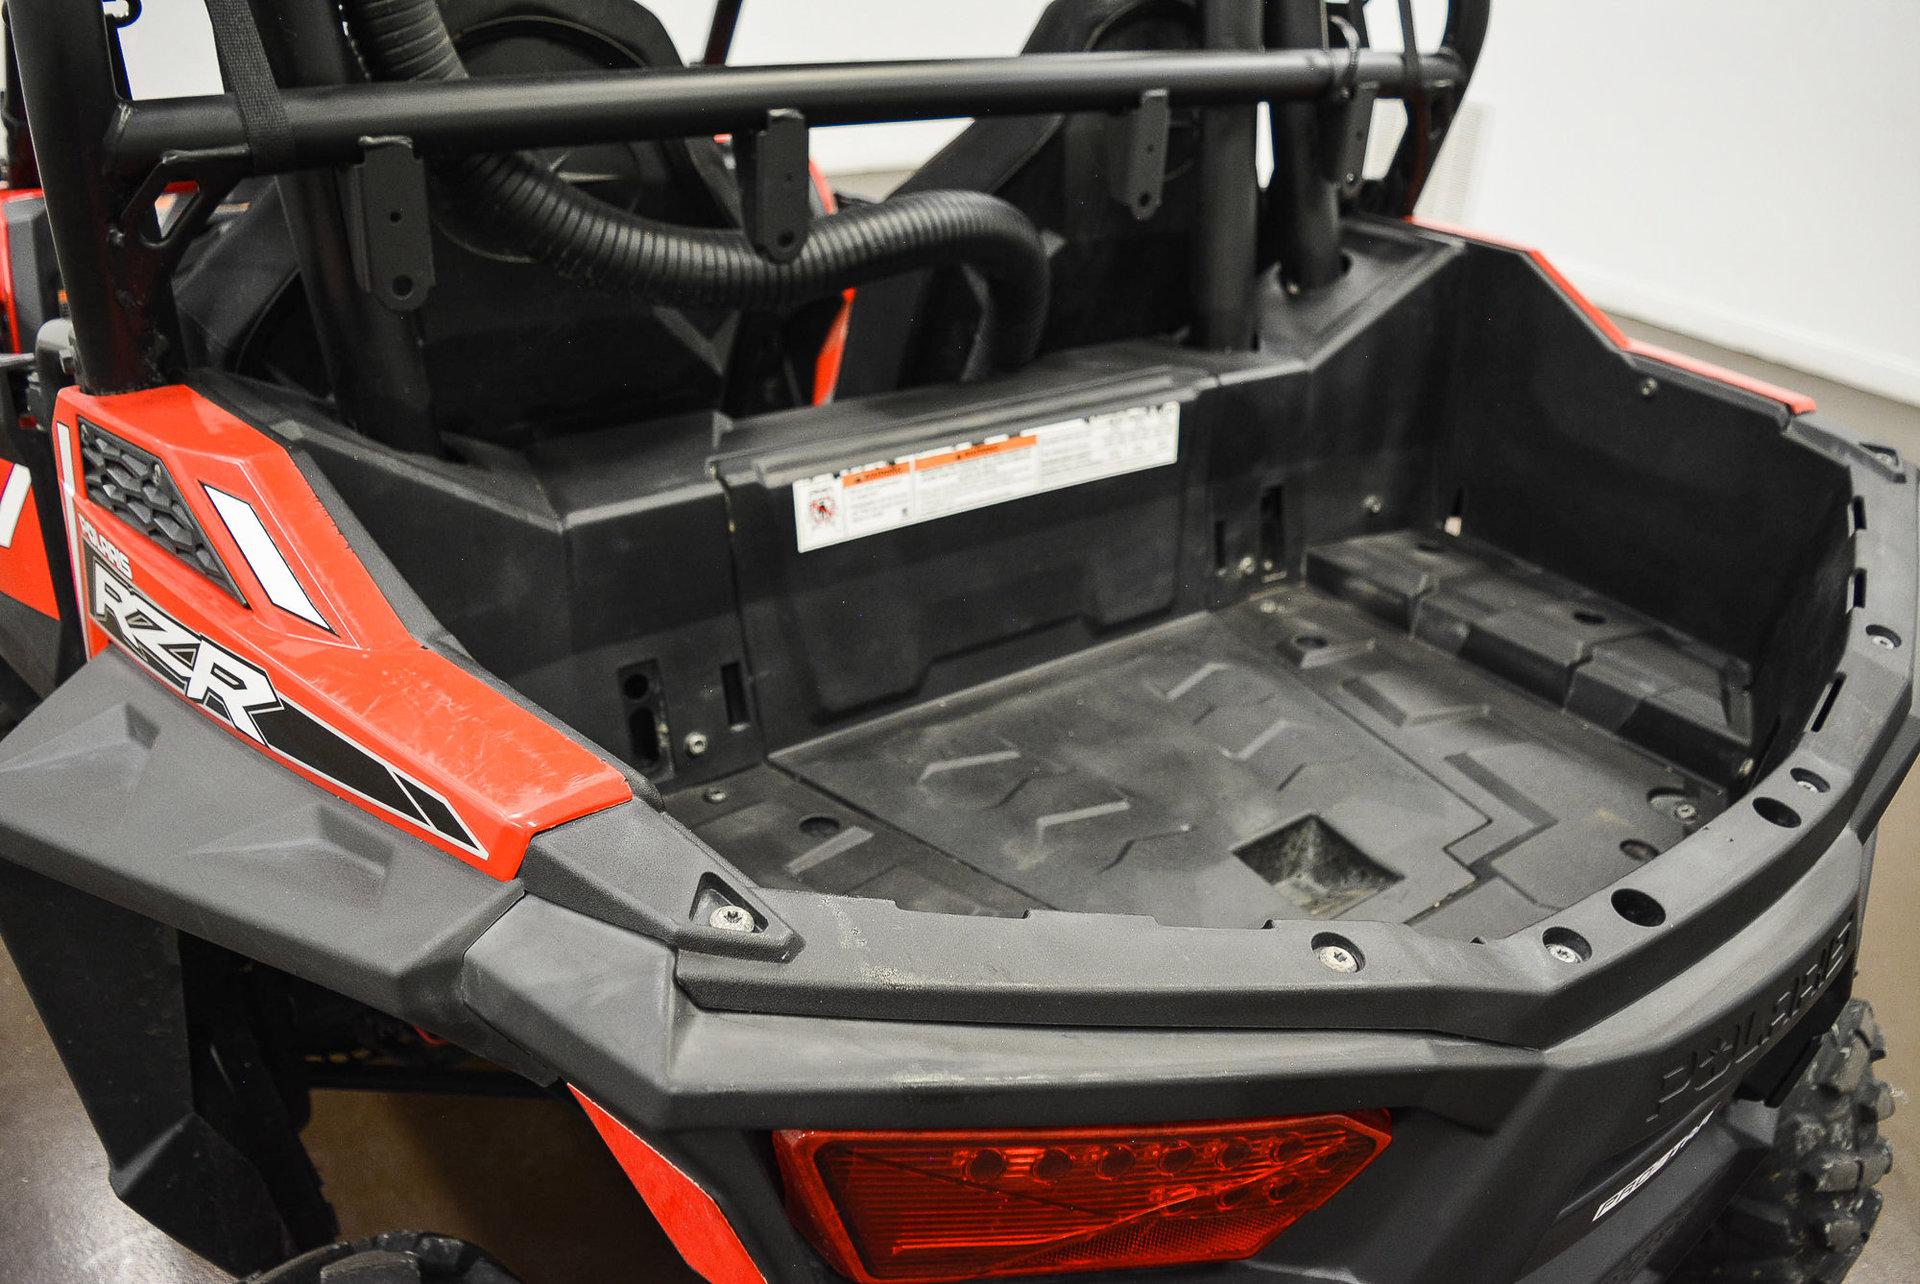 2015 Polaris Razor Classic Car Liquidators In Sherman Tx